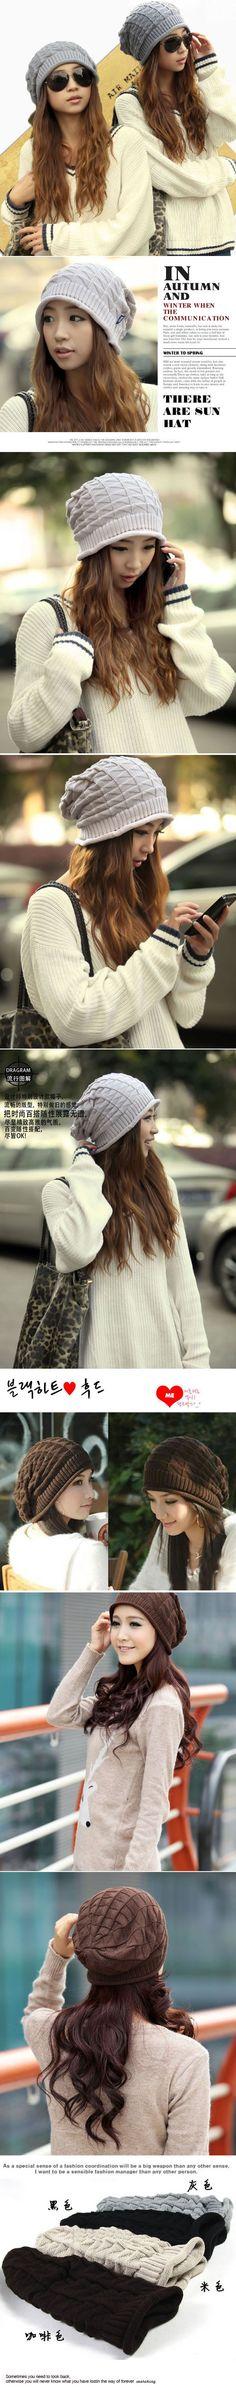 Sullen Black Simple Knitting Wool Fashion Hats,Knitting Wool Hats http://earrings.asumall.com/